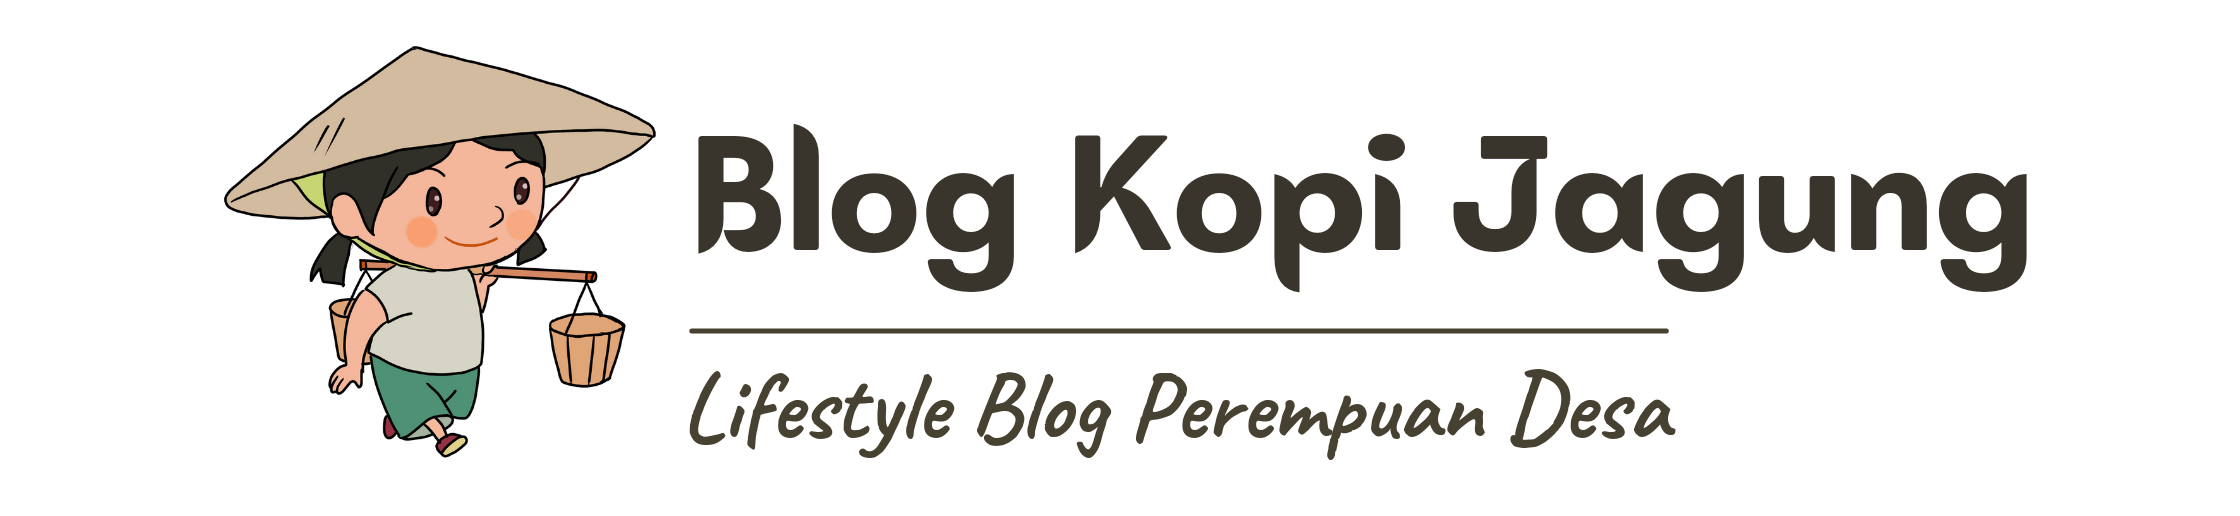 Kopi Jagung Lifestyle Blog Perempuan Desa